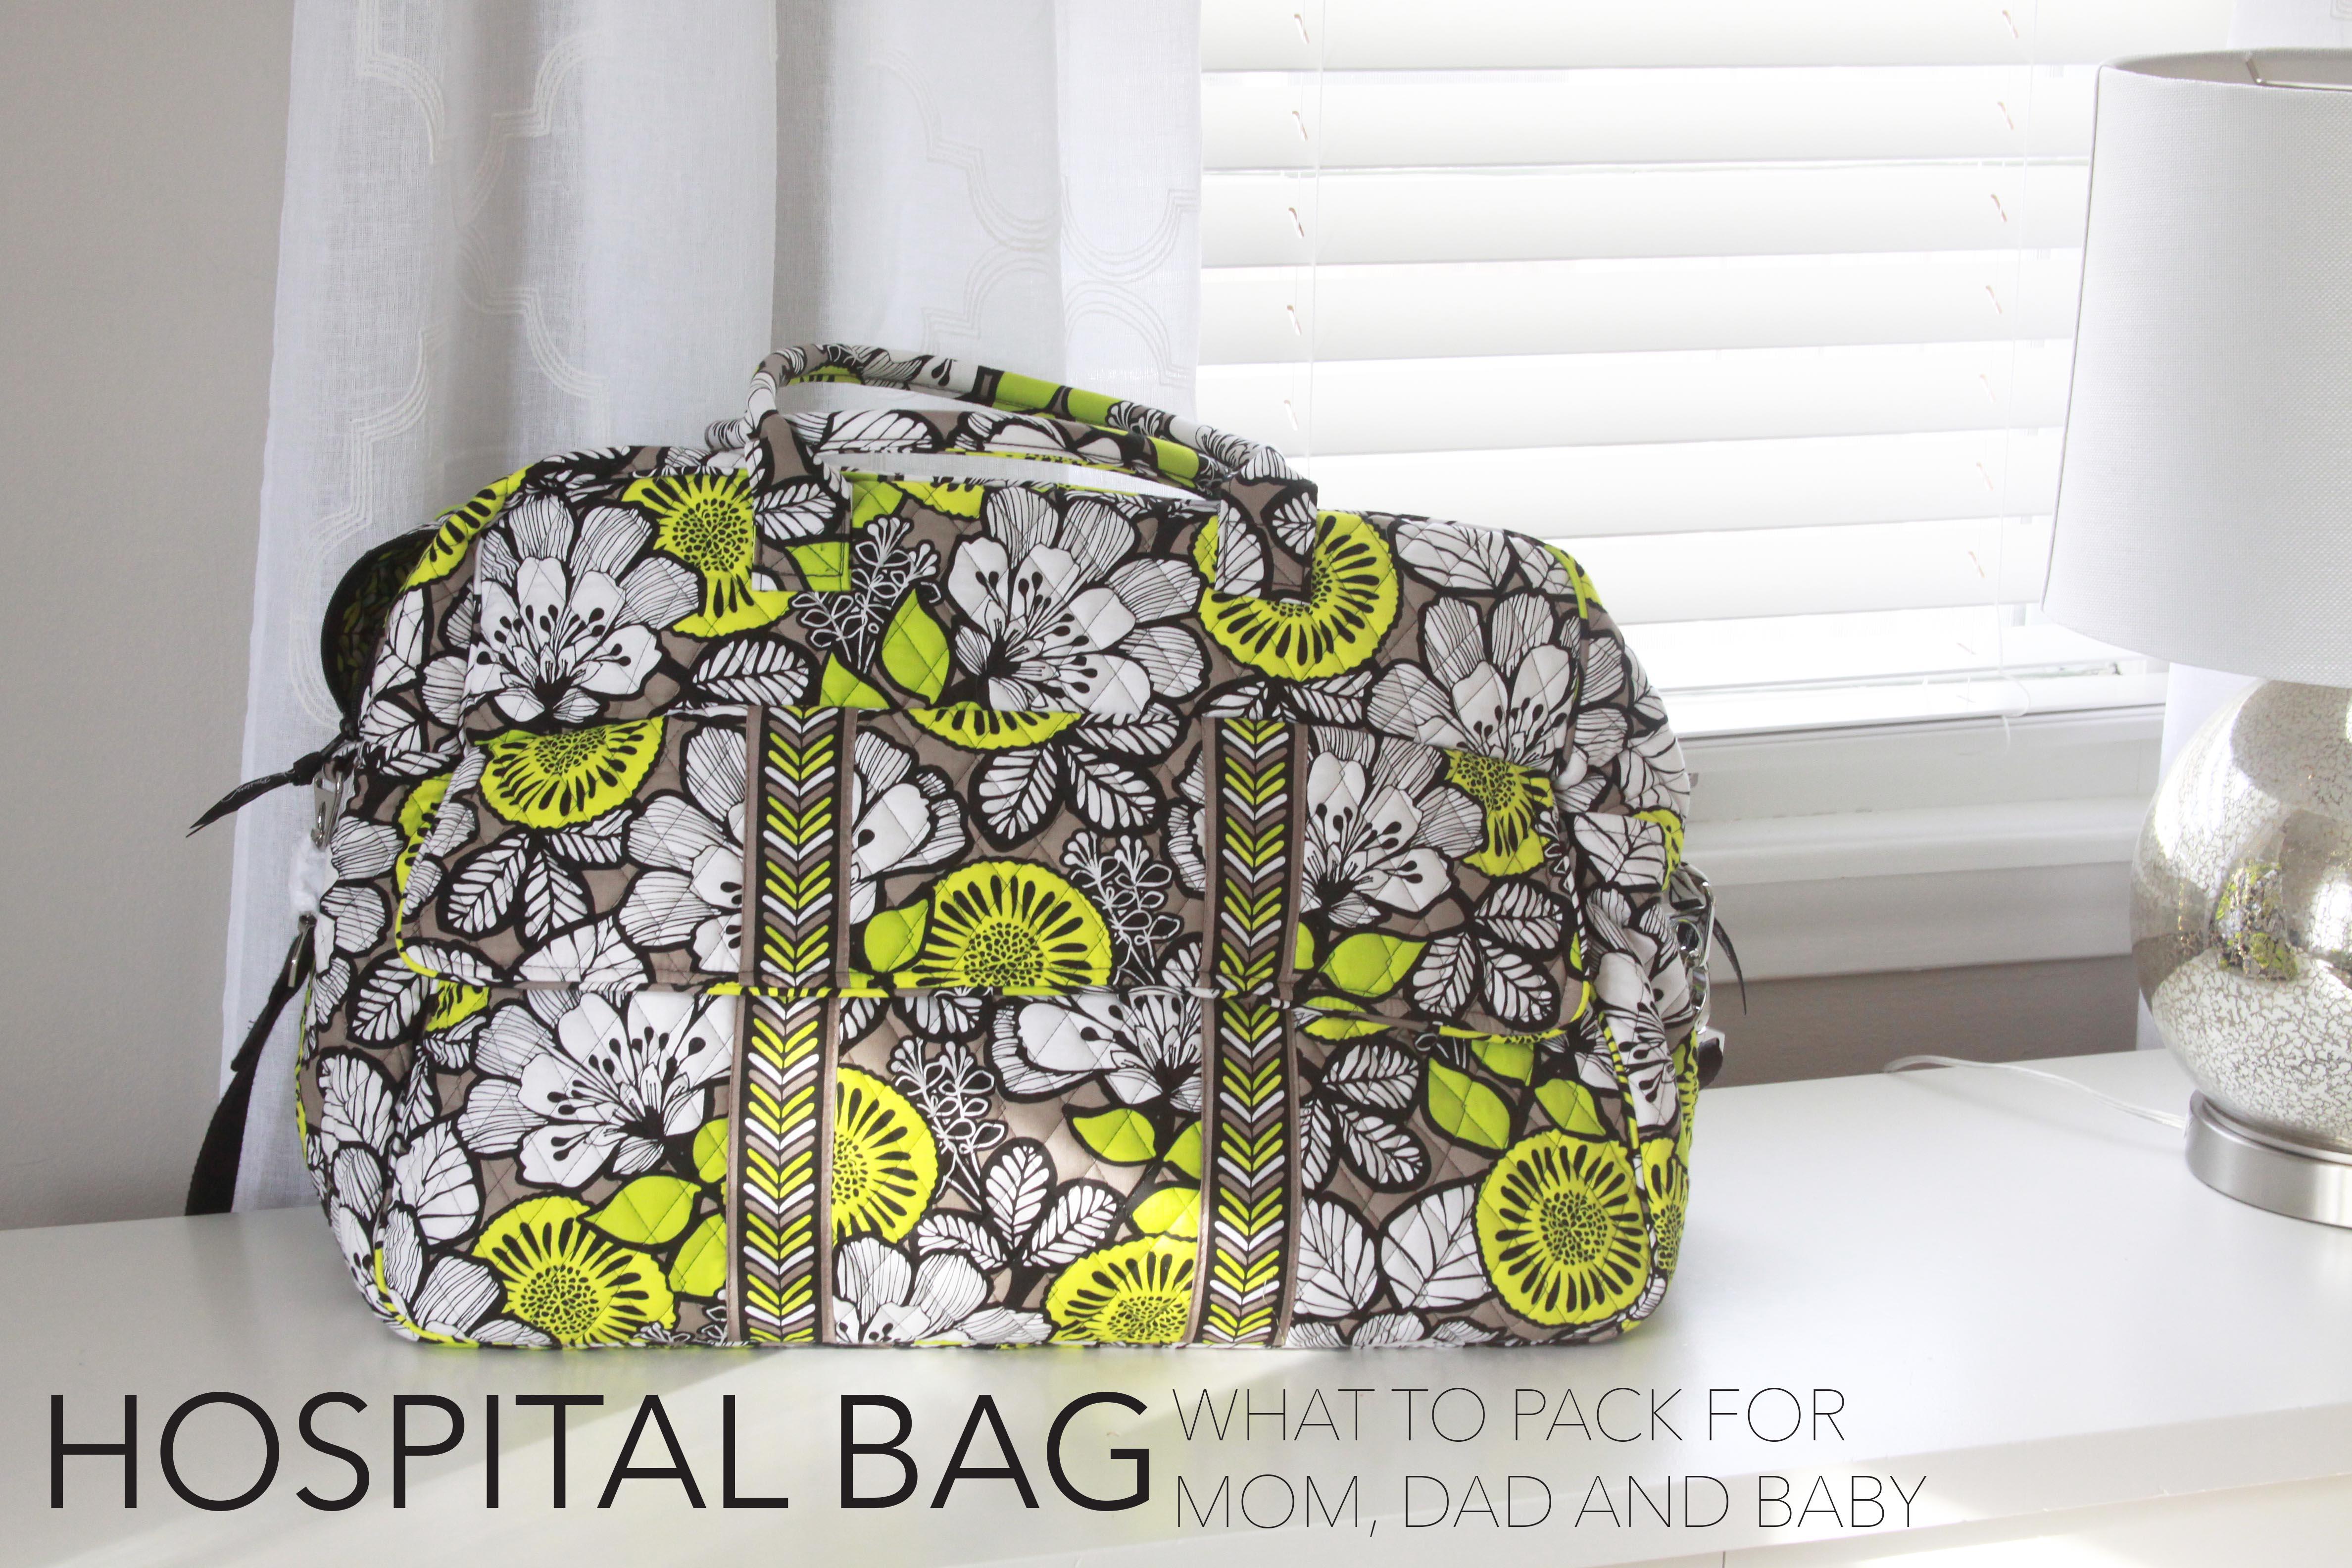 My Hospital Bag Essentials